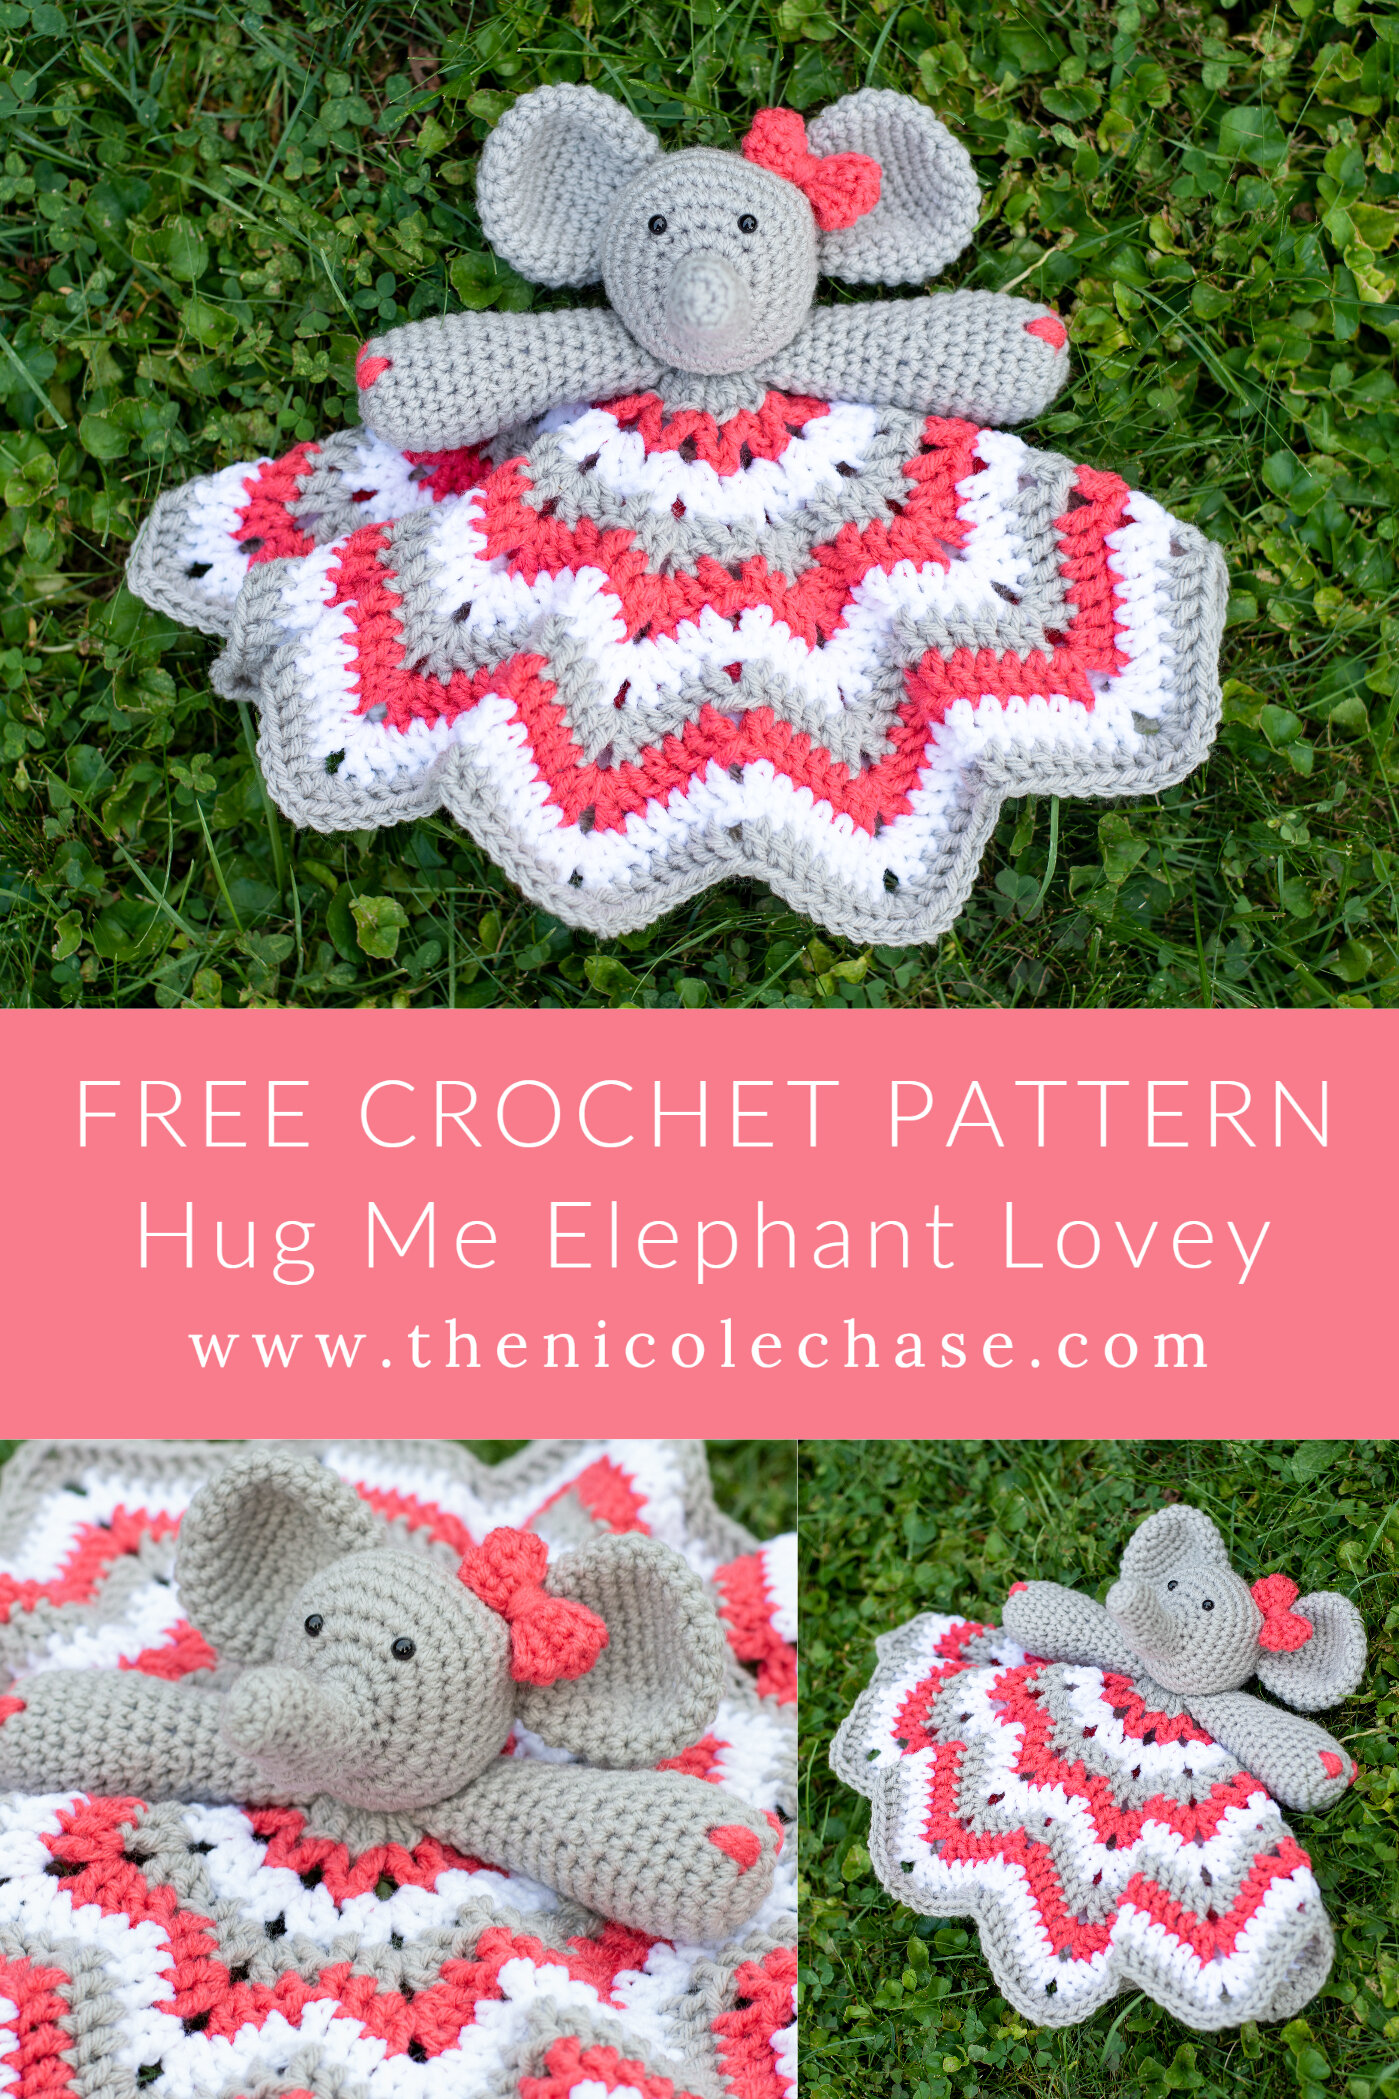 Mini Safari Friends by Amigurumi To Go Free Crochet Patterns Here ... | 1500x1000